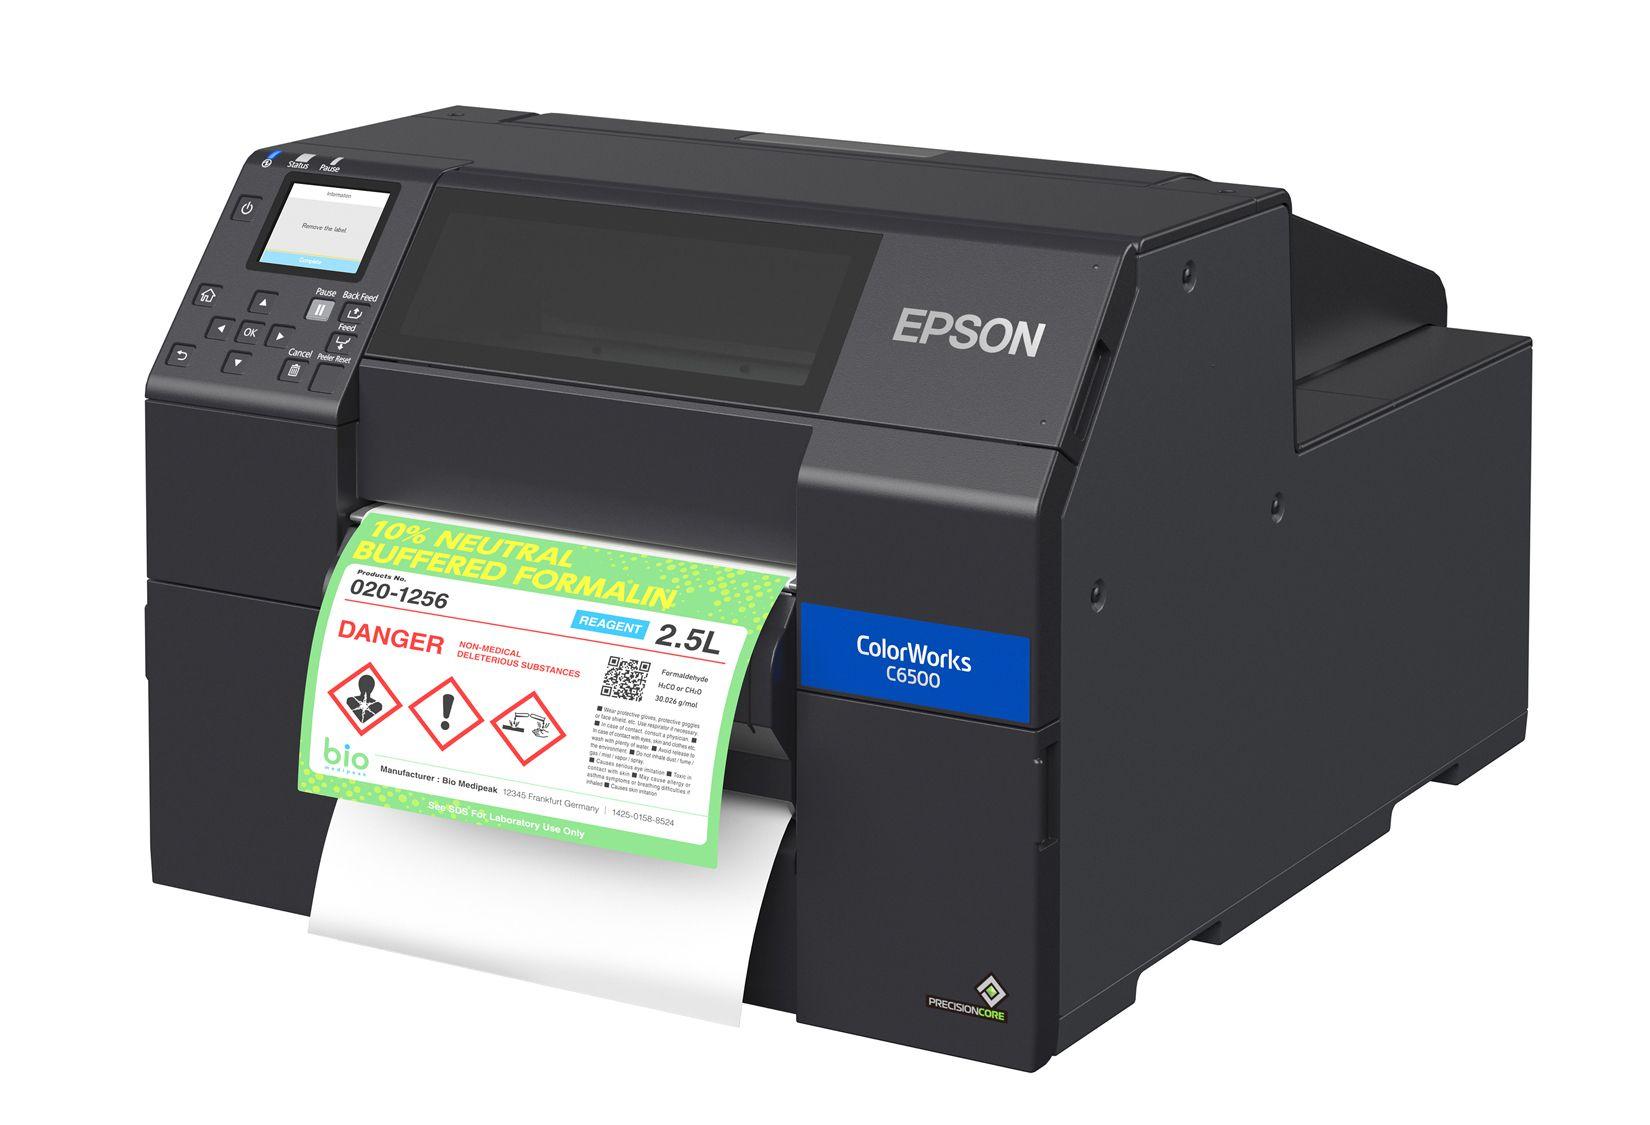 Epson ColorWorks C6500P Color Label Printer Peeler